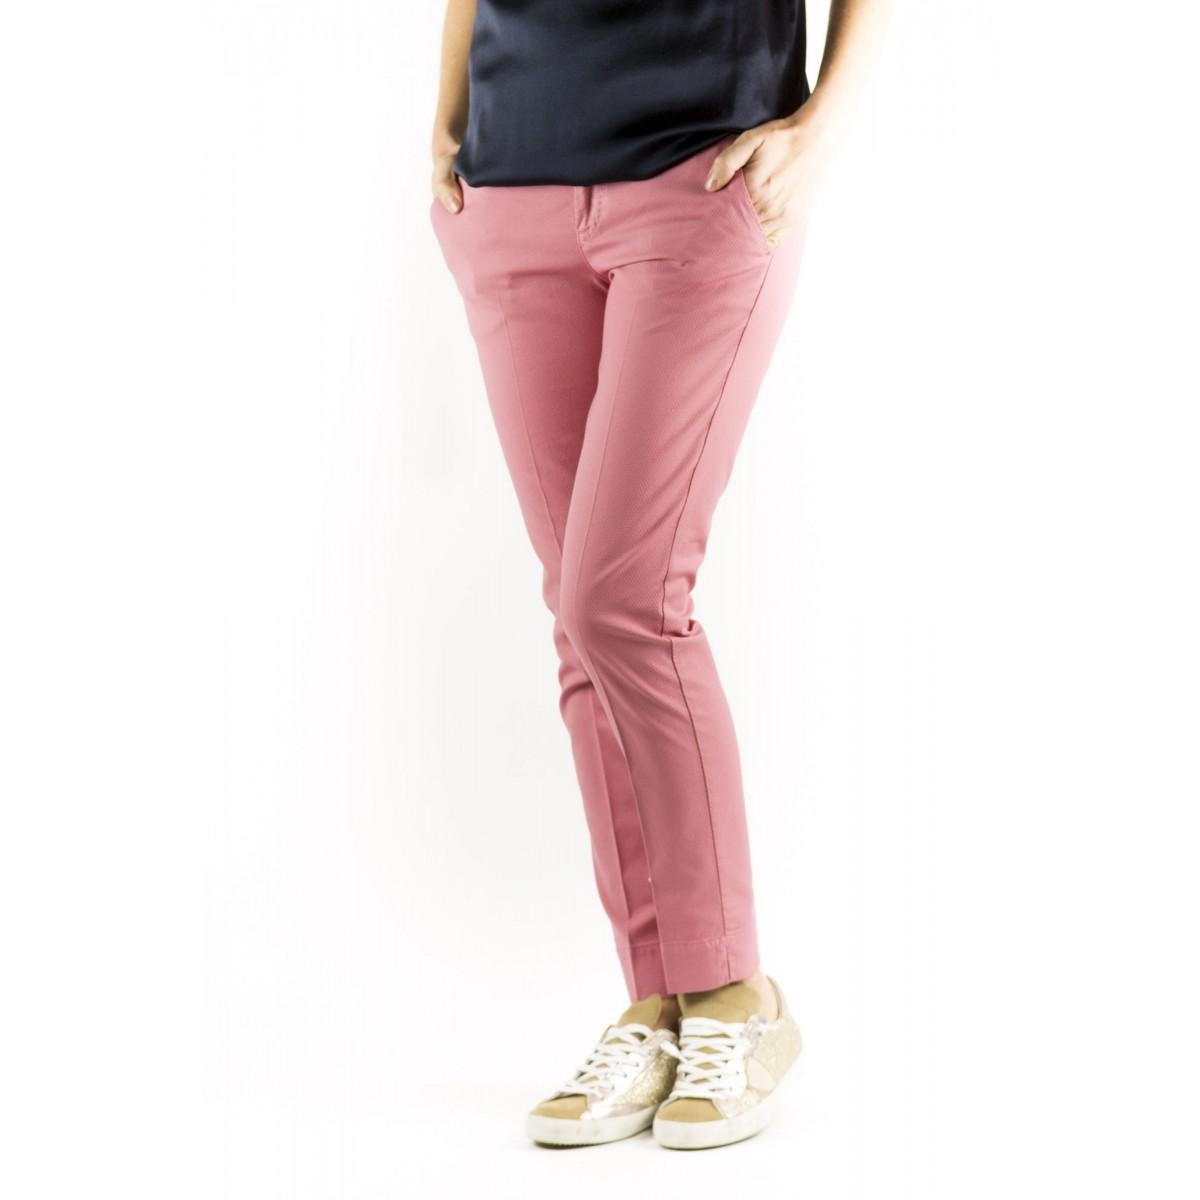 Pantalone PTW Donna - VTNY Ts63 Piquet Cotone Strech